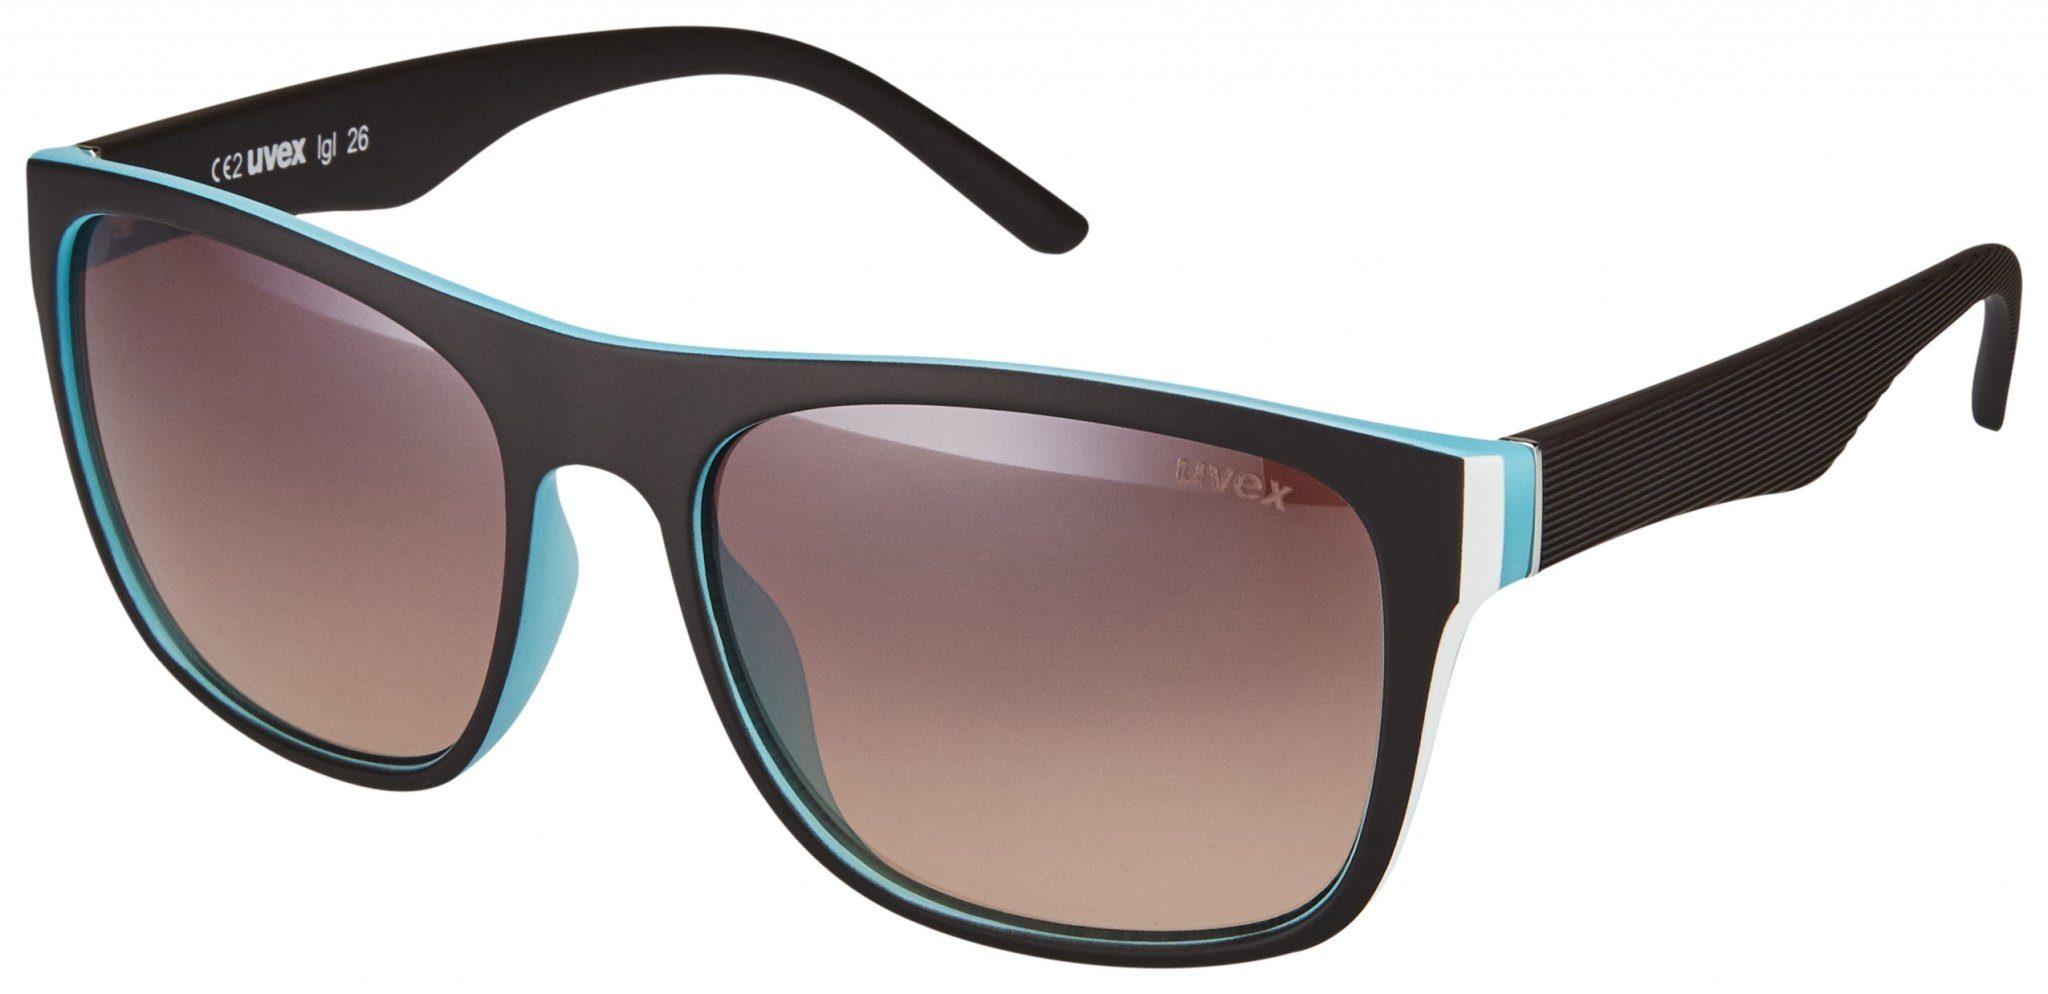 Uvex Radsportbrille »lgl 26 Glasses«